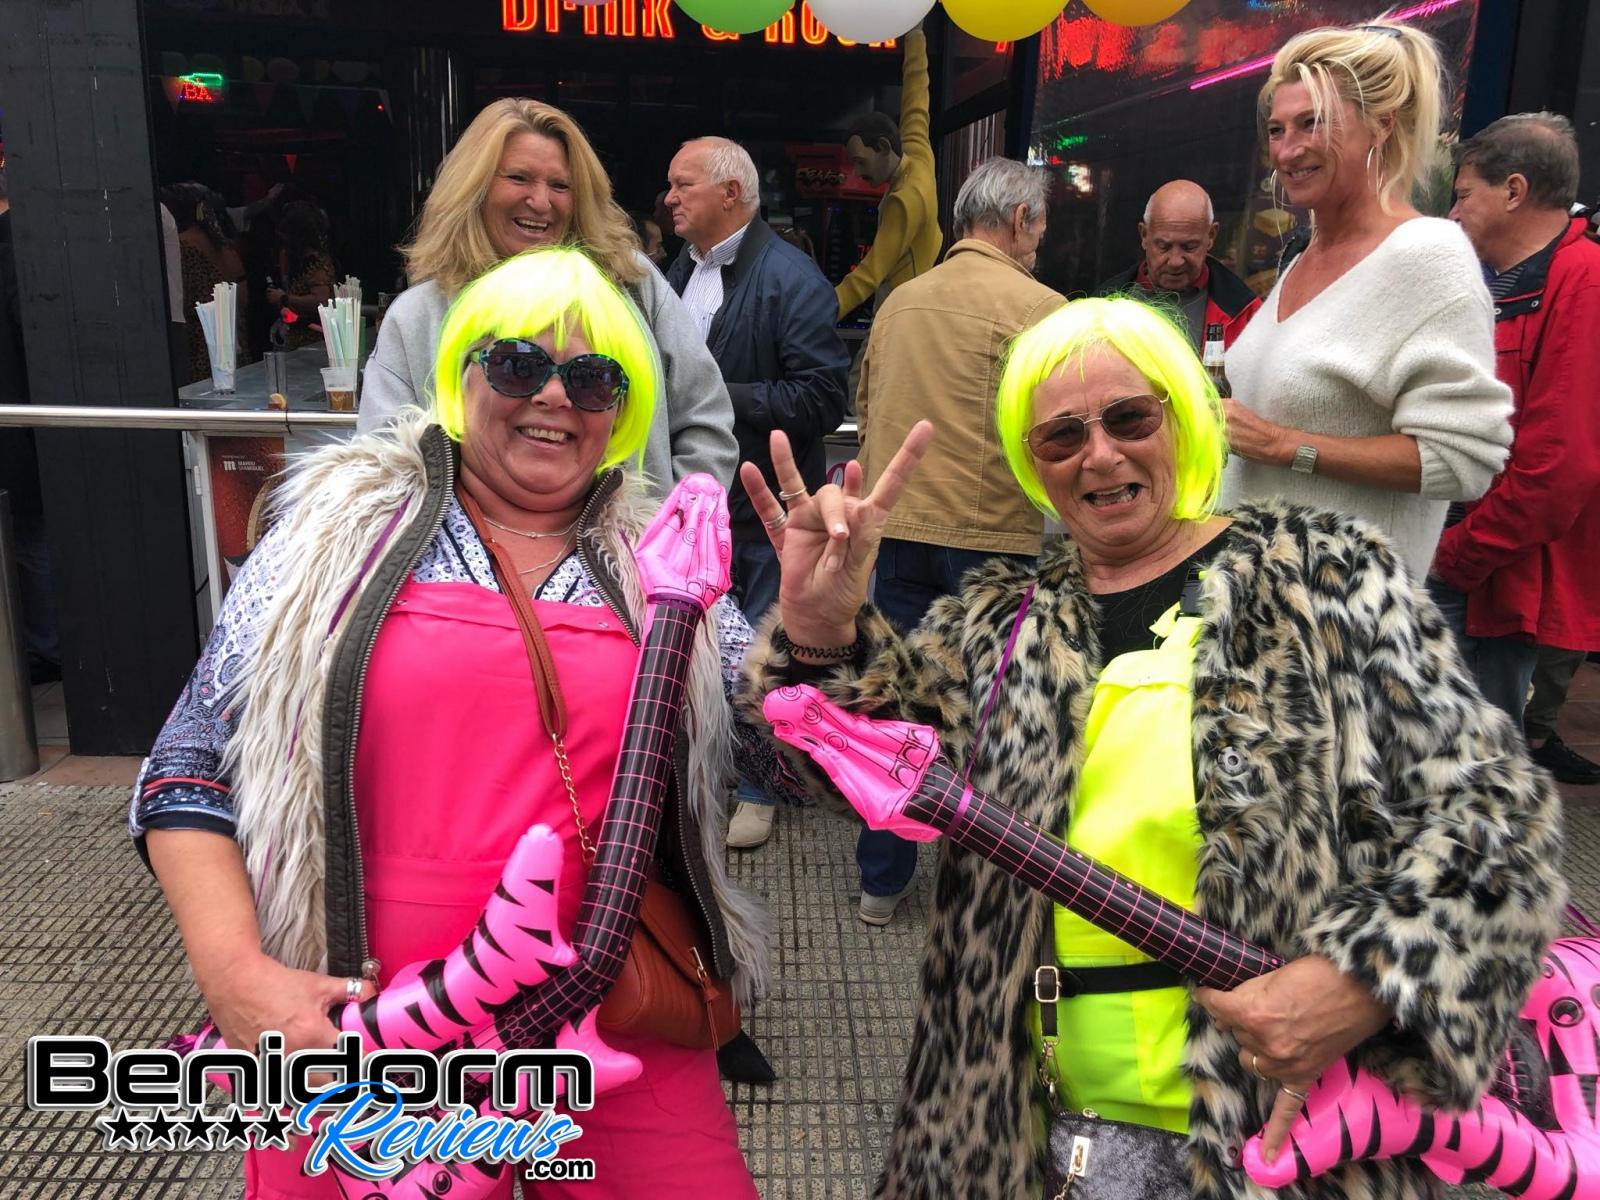 Benidorm-Fiestas-2019-Fancy-Dress-27